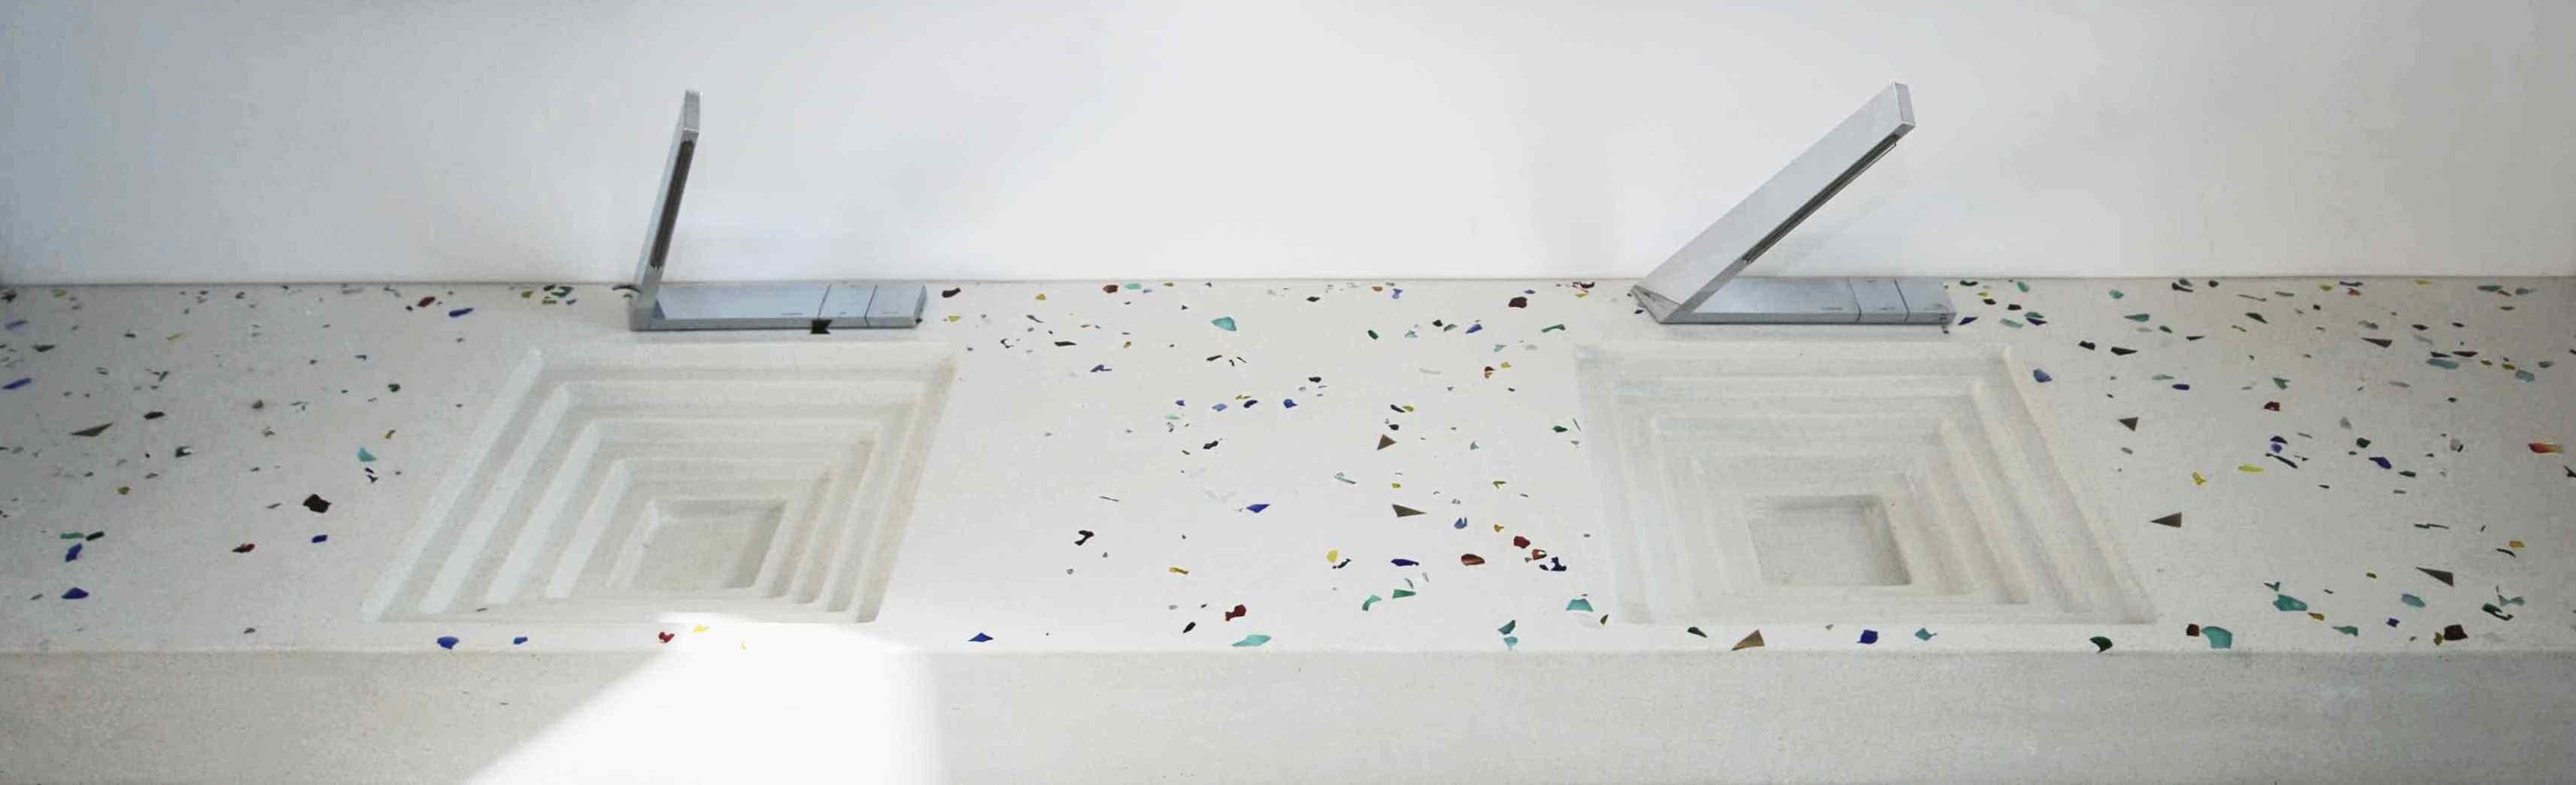 Concrete Sink 6.7